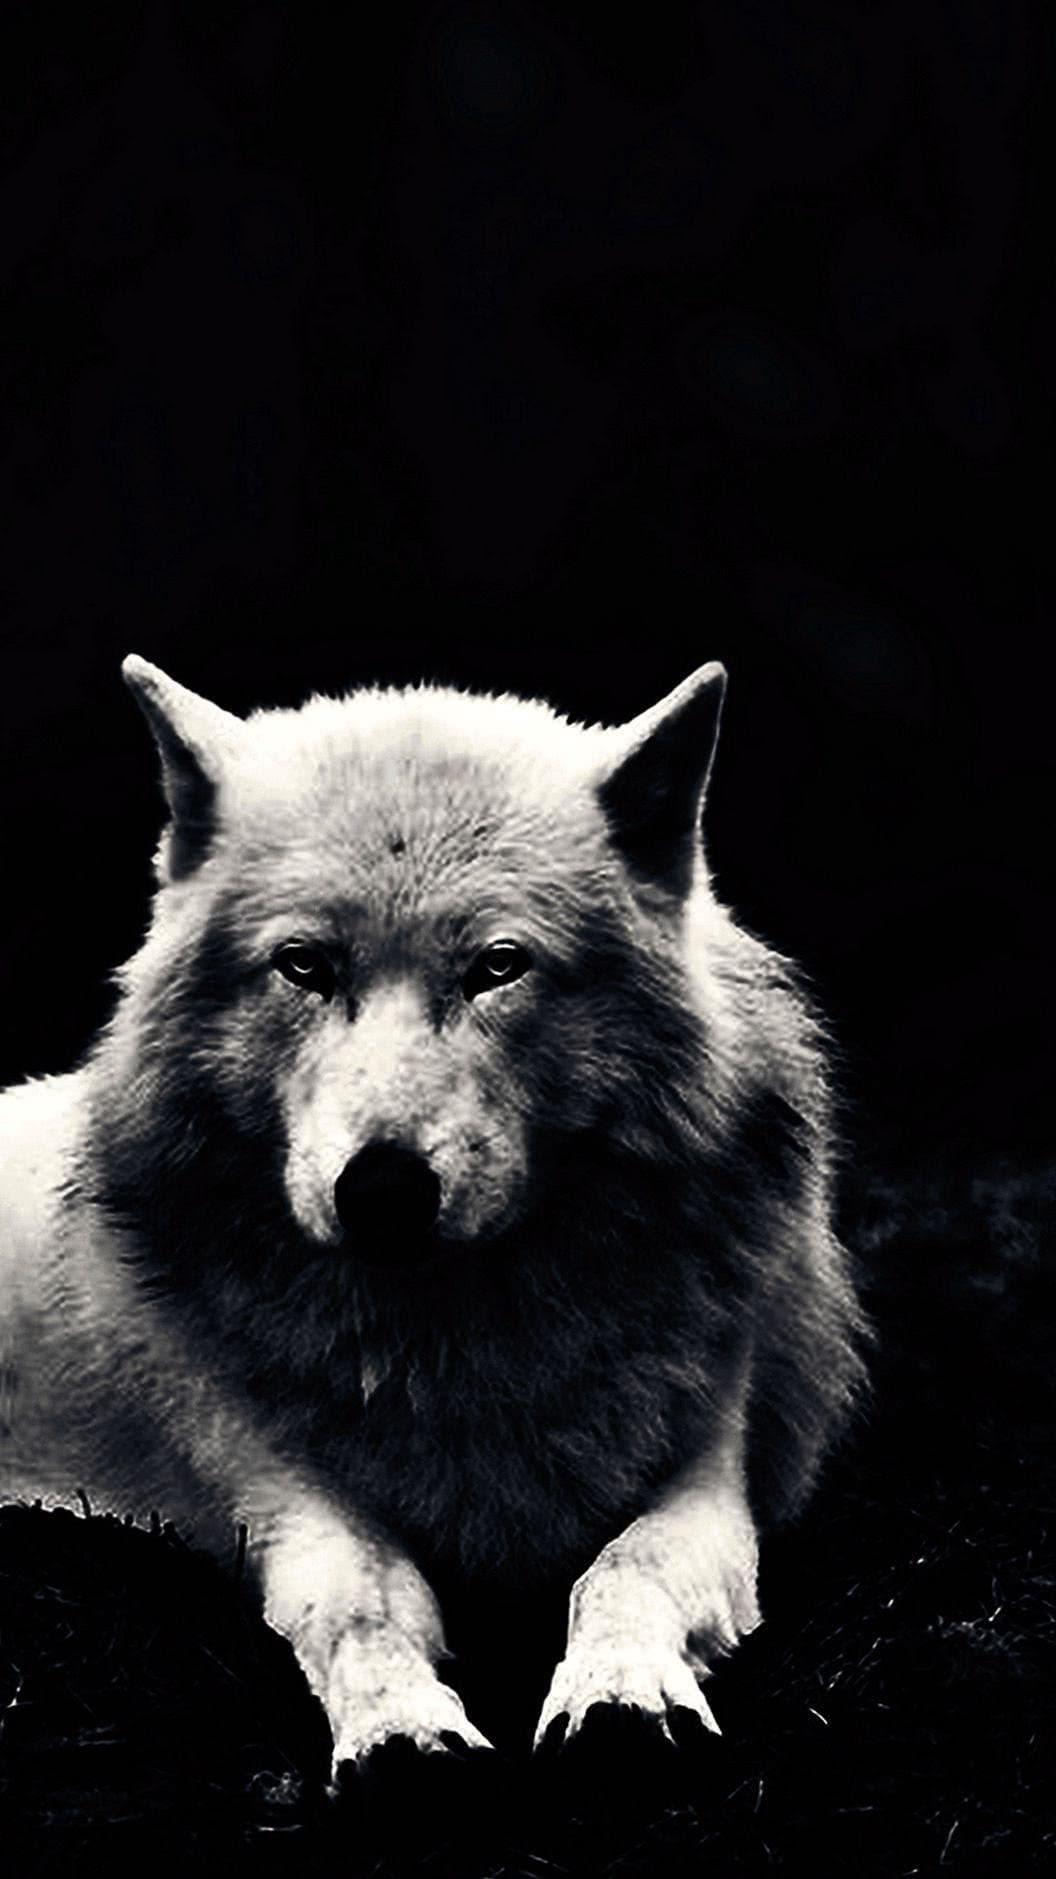 Mobile Wallpaper HD Wolf